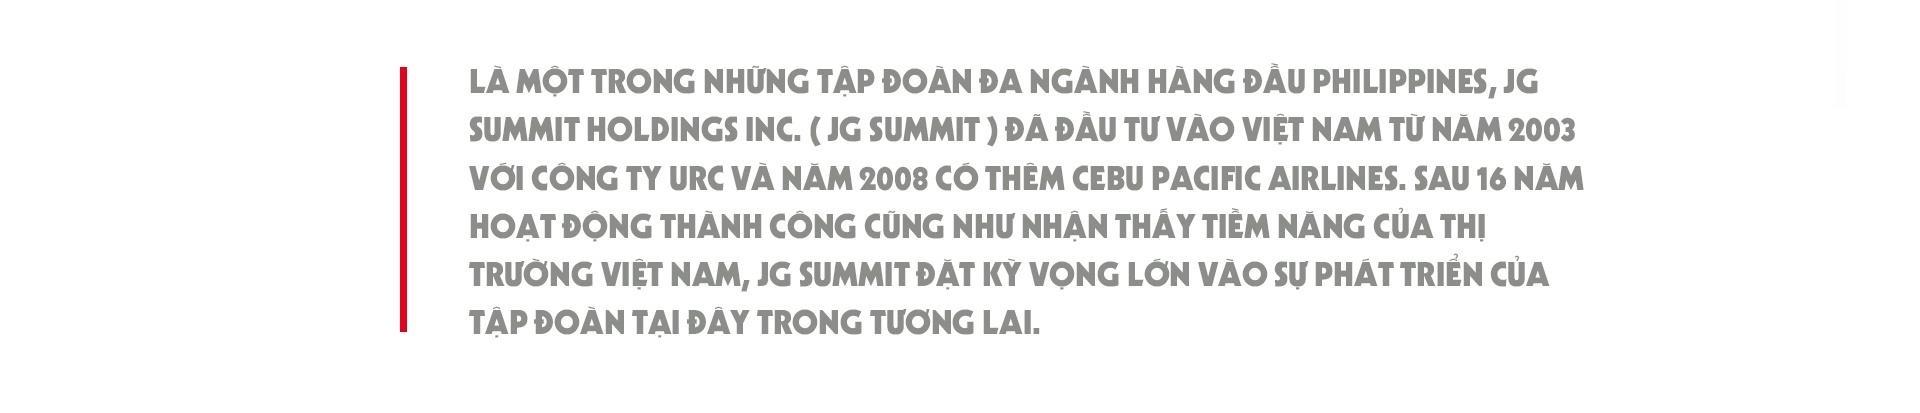 CEO JG Summit: 'Toi tin o tiem nang phat trien cua tap doan tai VN' hinh anh 3